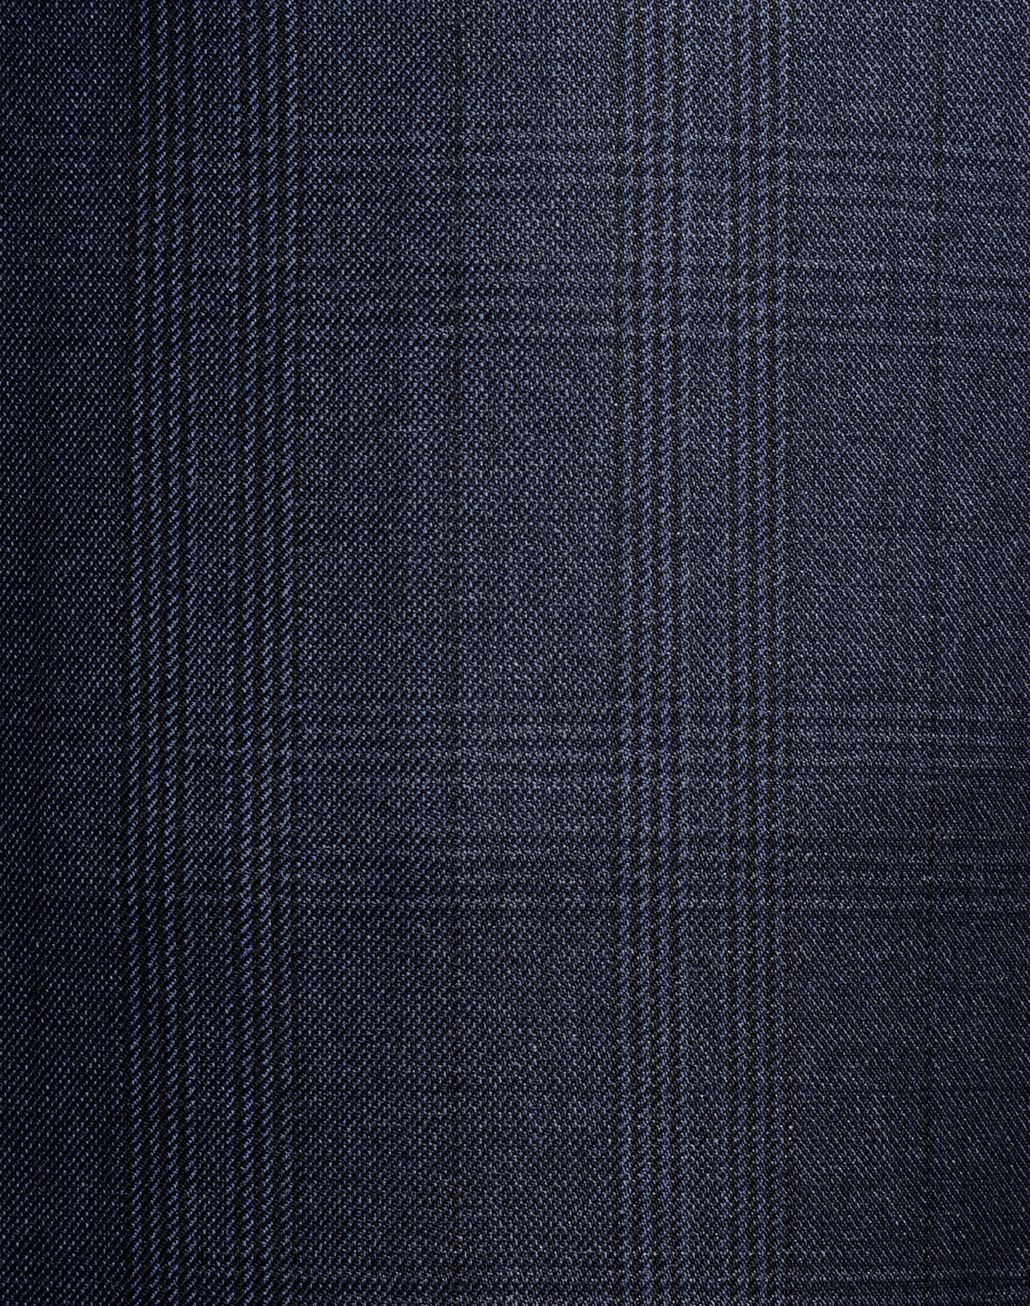 BRIONI Prince of Wales suit Suits & Jackets U a